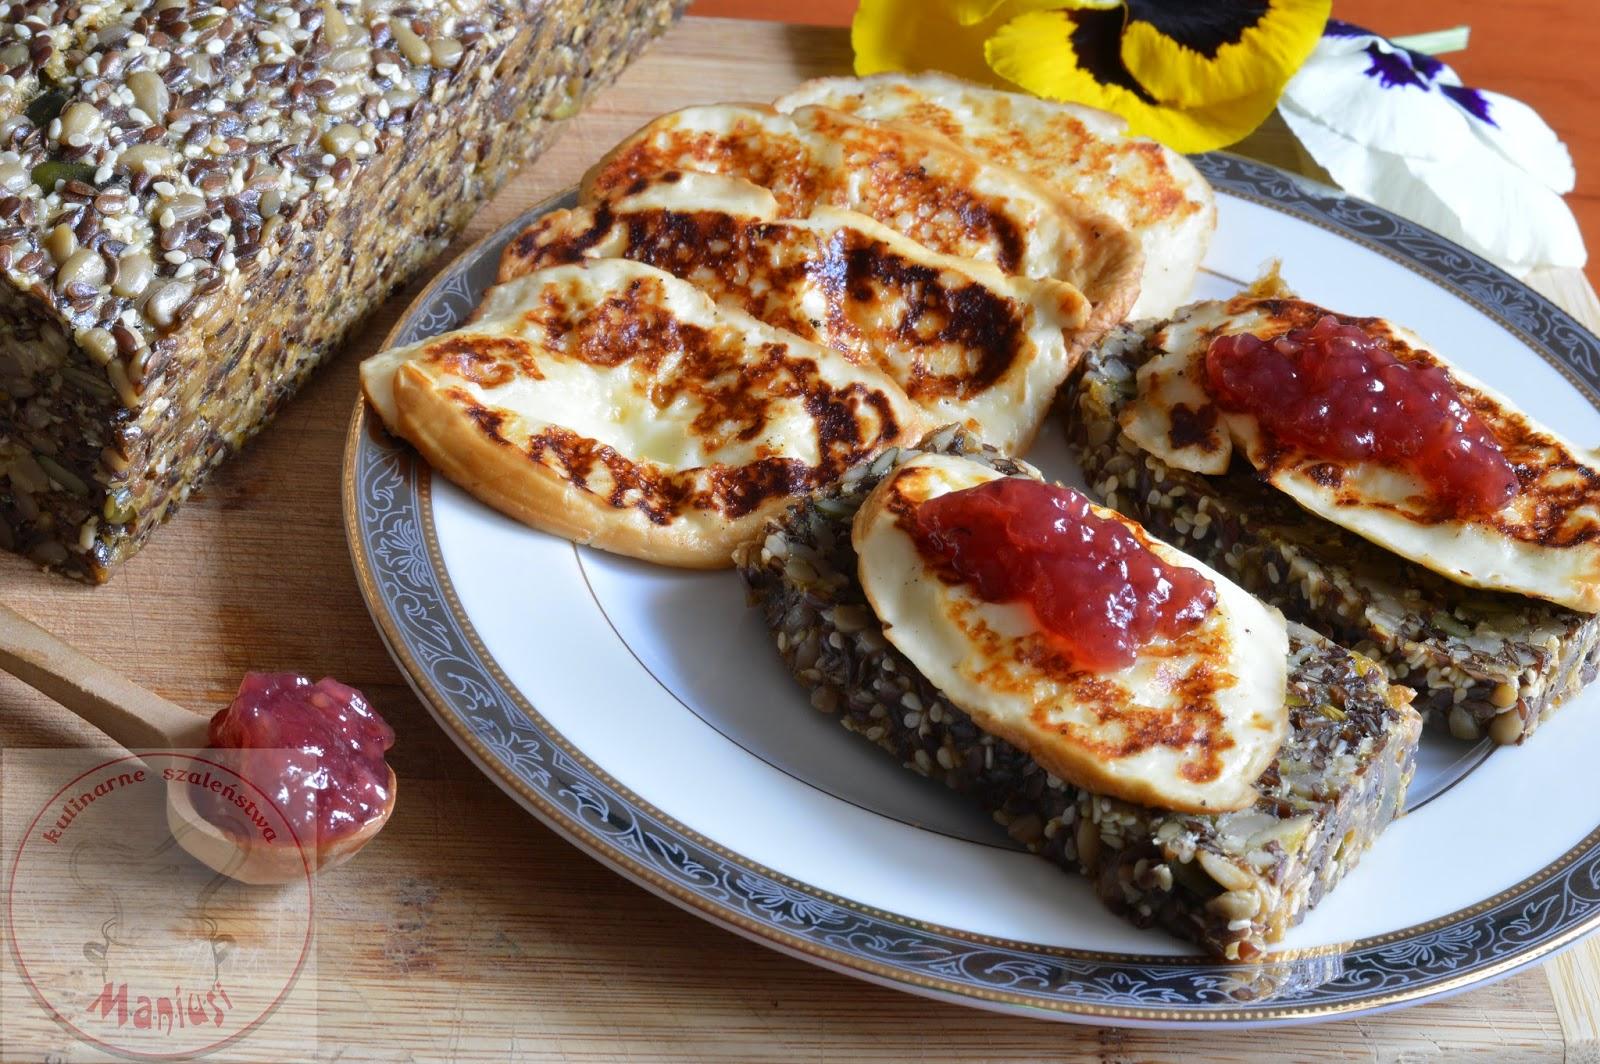 Chleb bez mąki i oscypek